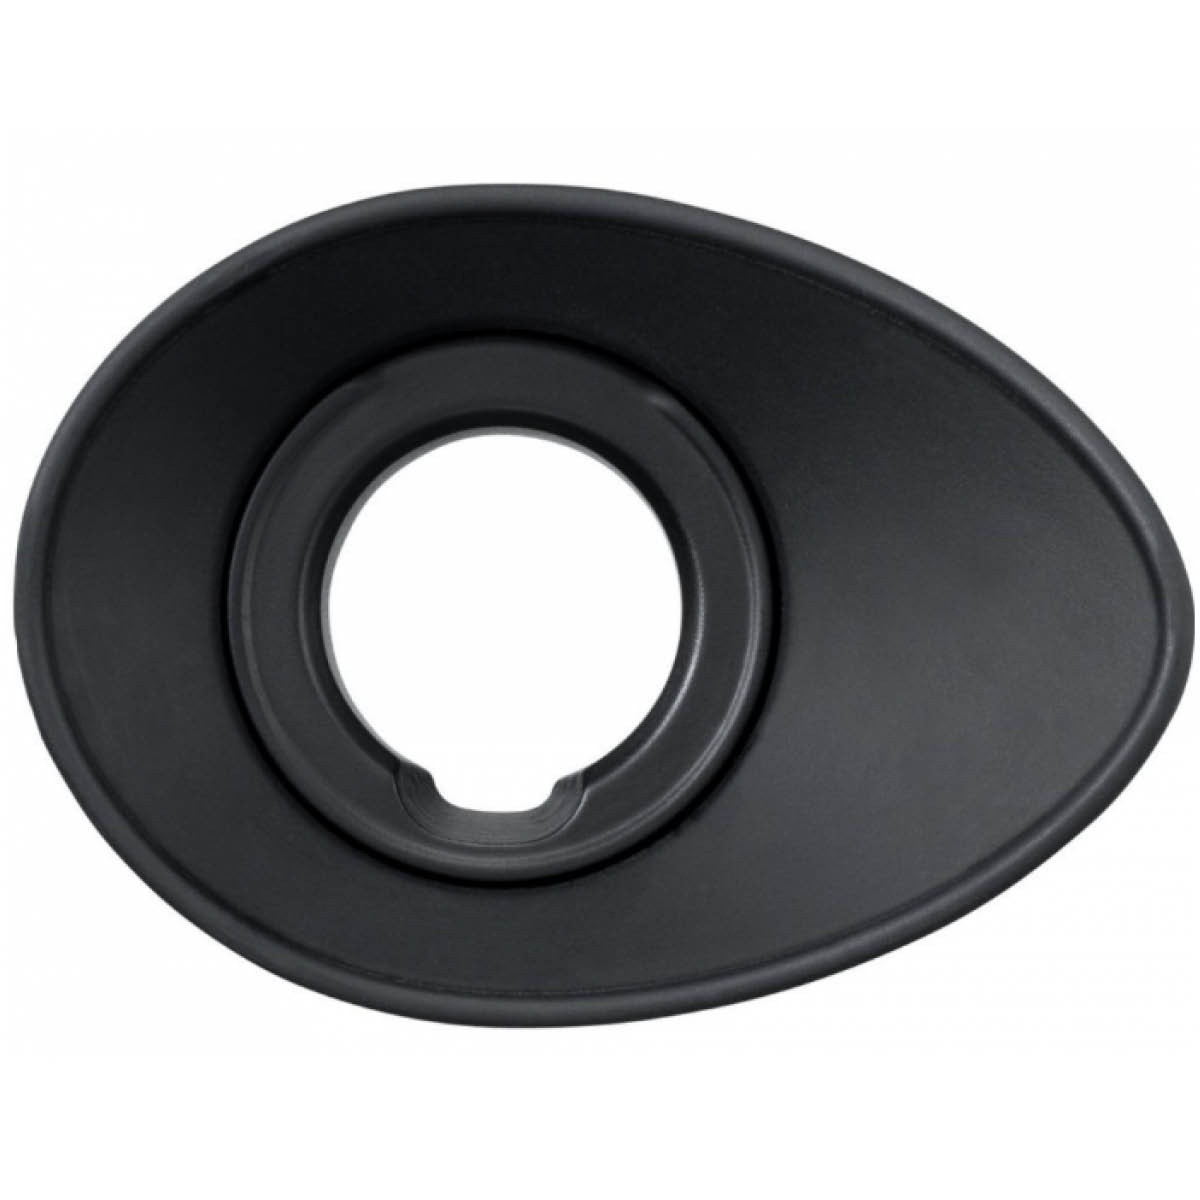 Fujifilm EC-XH W Augenmuschel